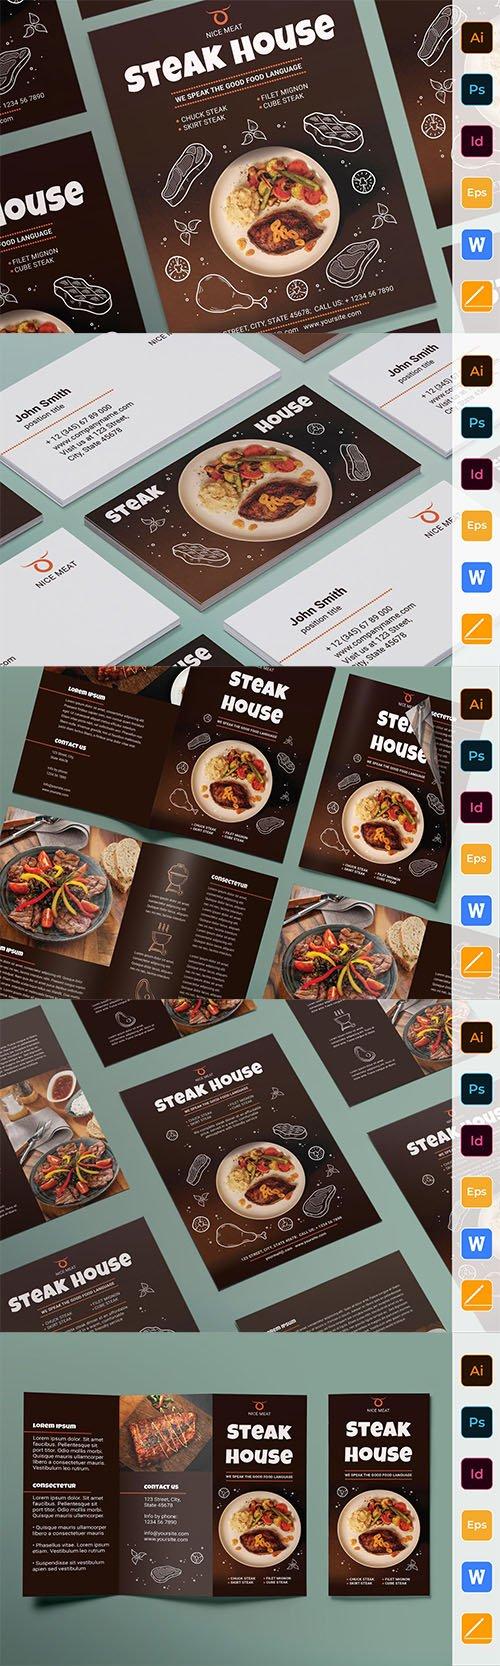 Steak House Bundle